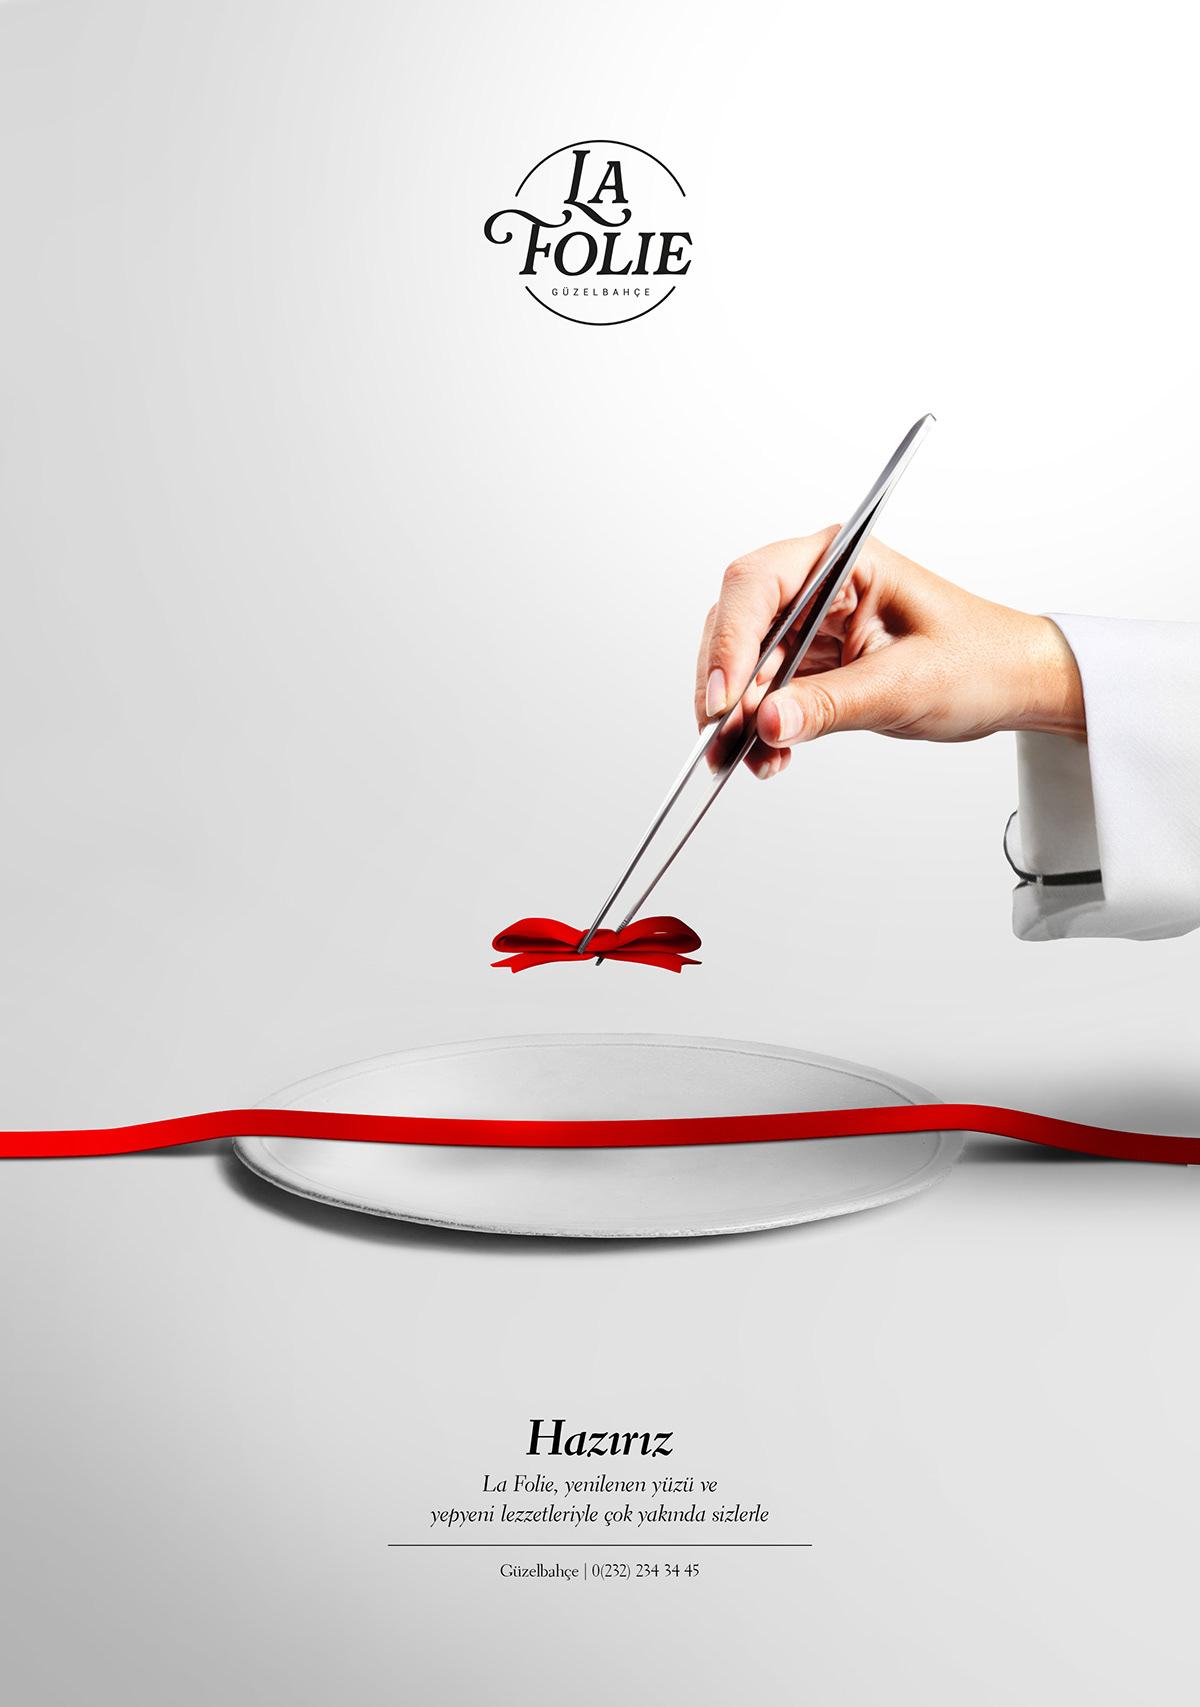 La Folie Opening Print Ad On Behance